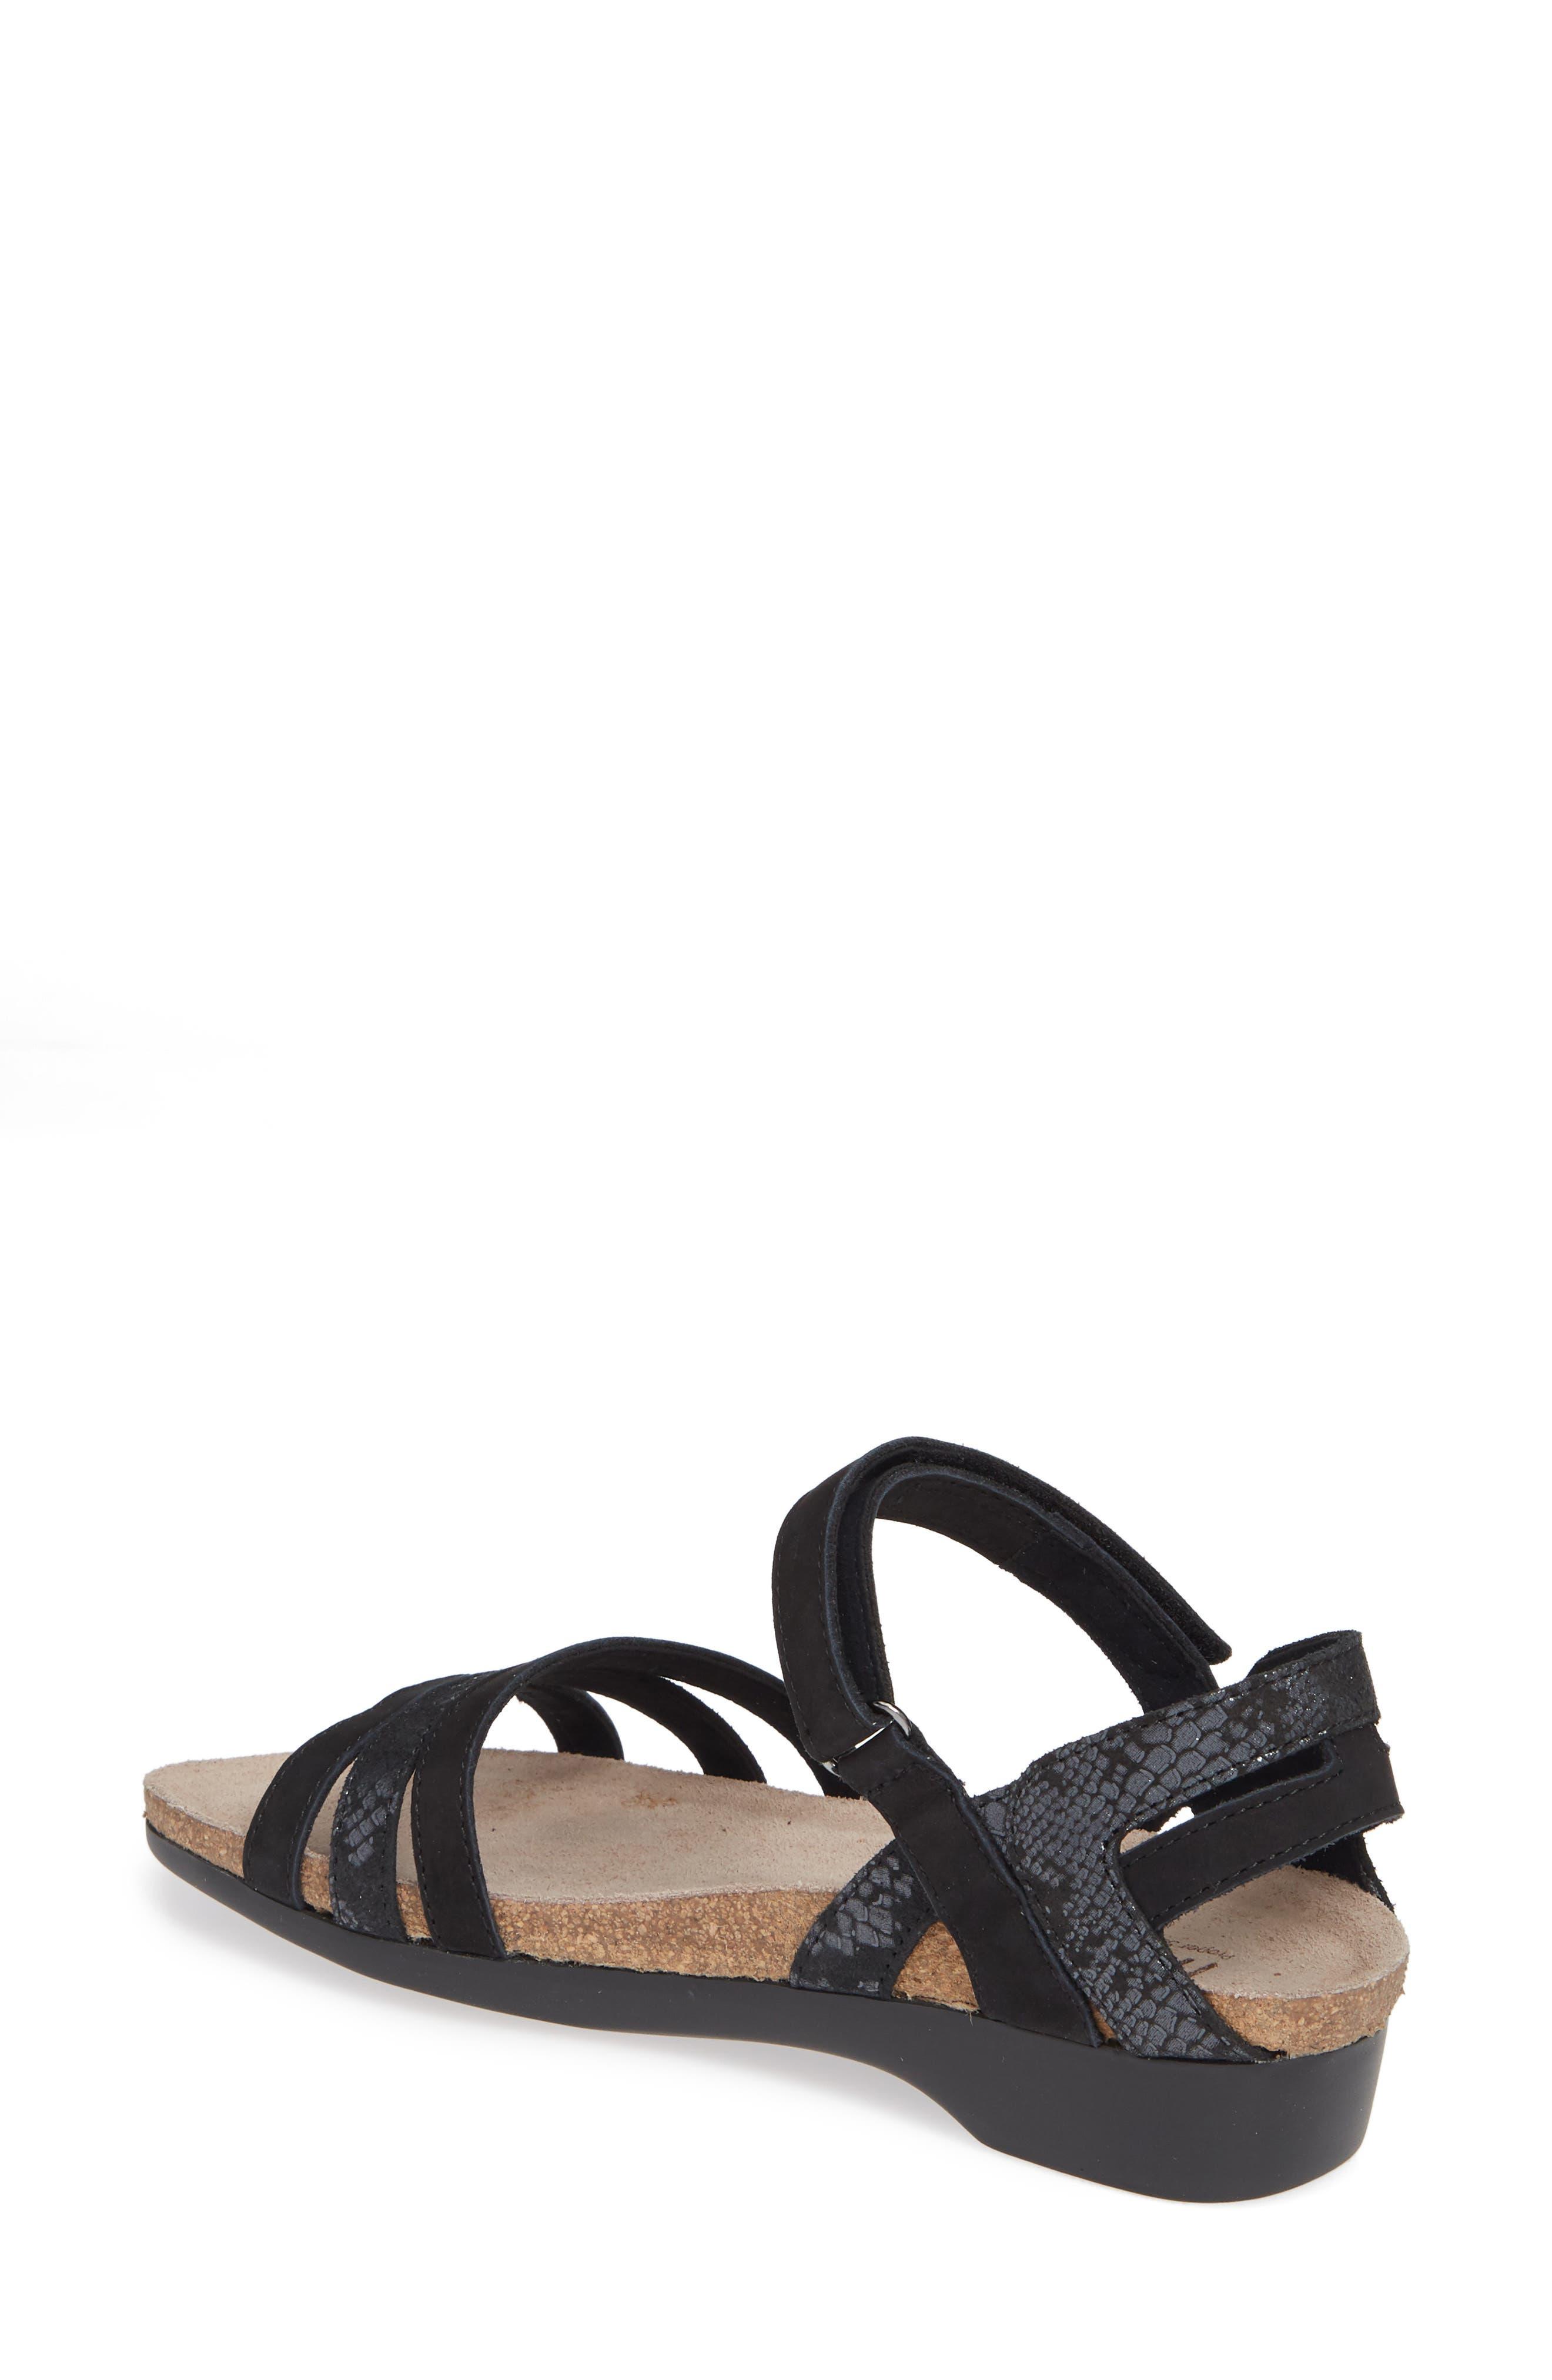 MUNRO, Summer Sandal, Alternate thumbnail 2, color, BLACK COMBO NUBUCK